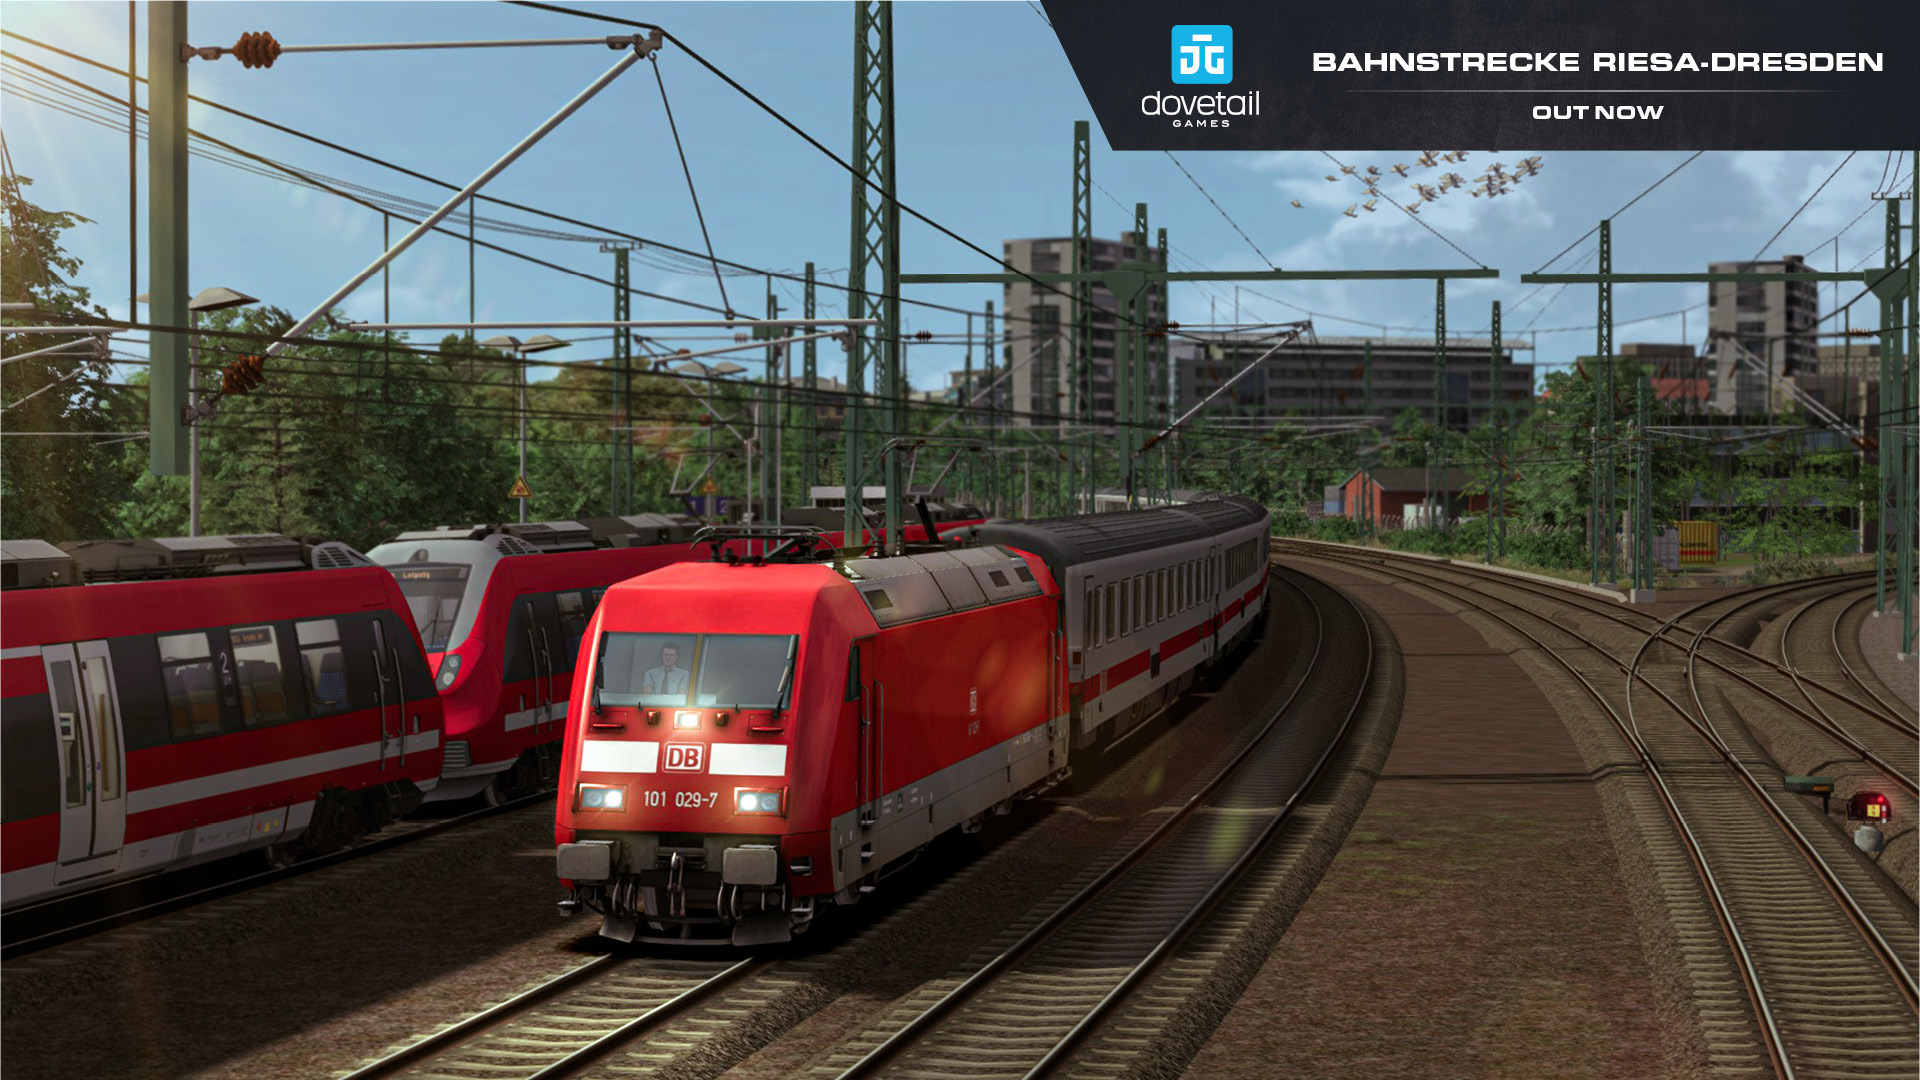 Bahnstrecke Riesa - Dresden | Out Now!